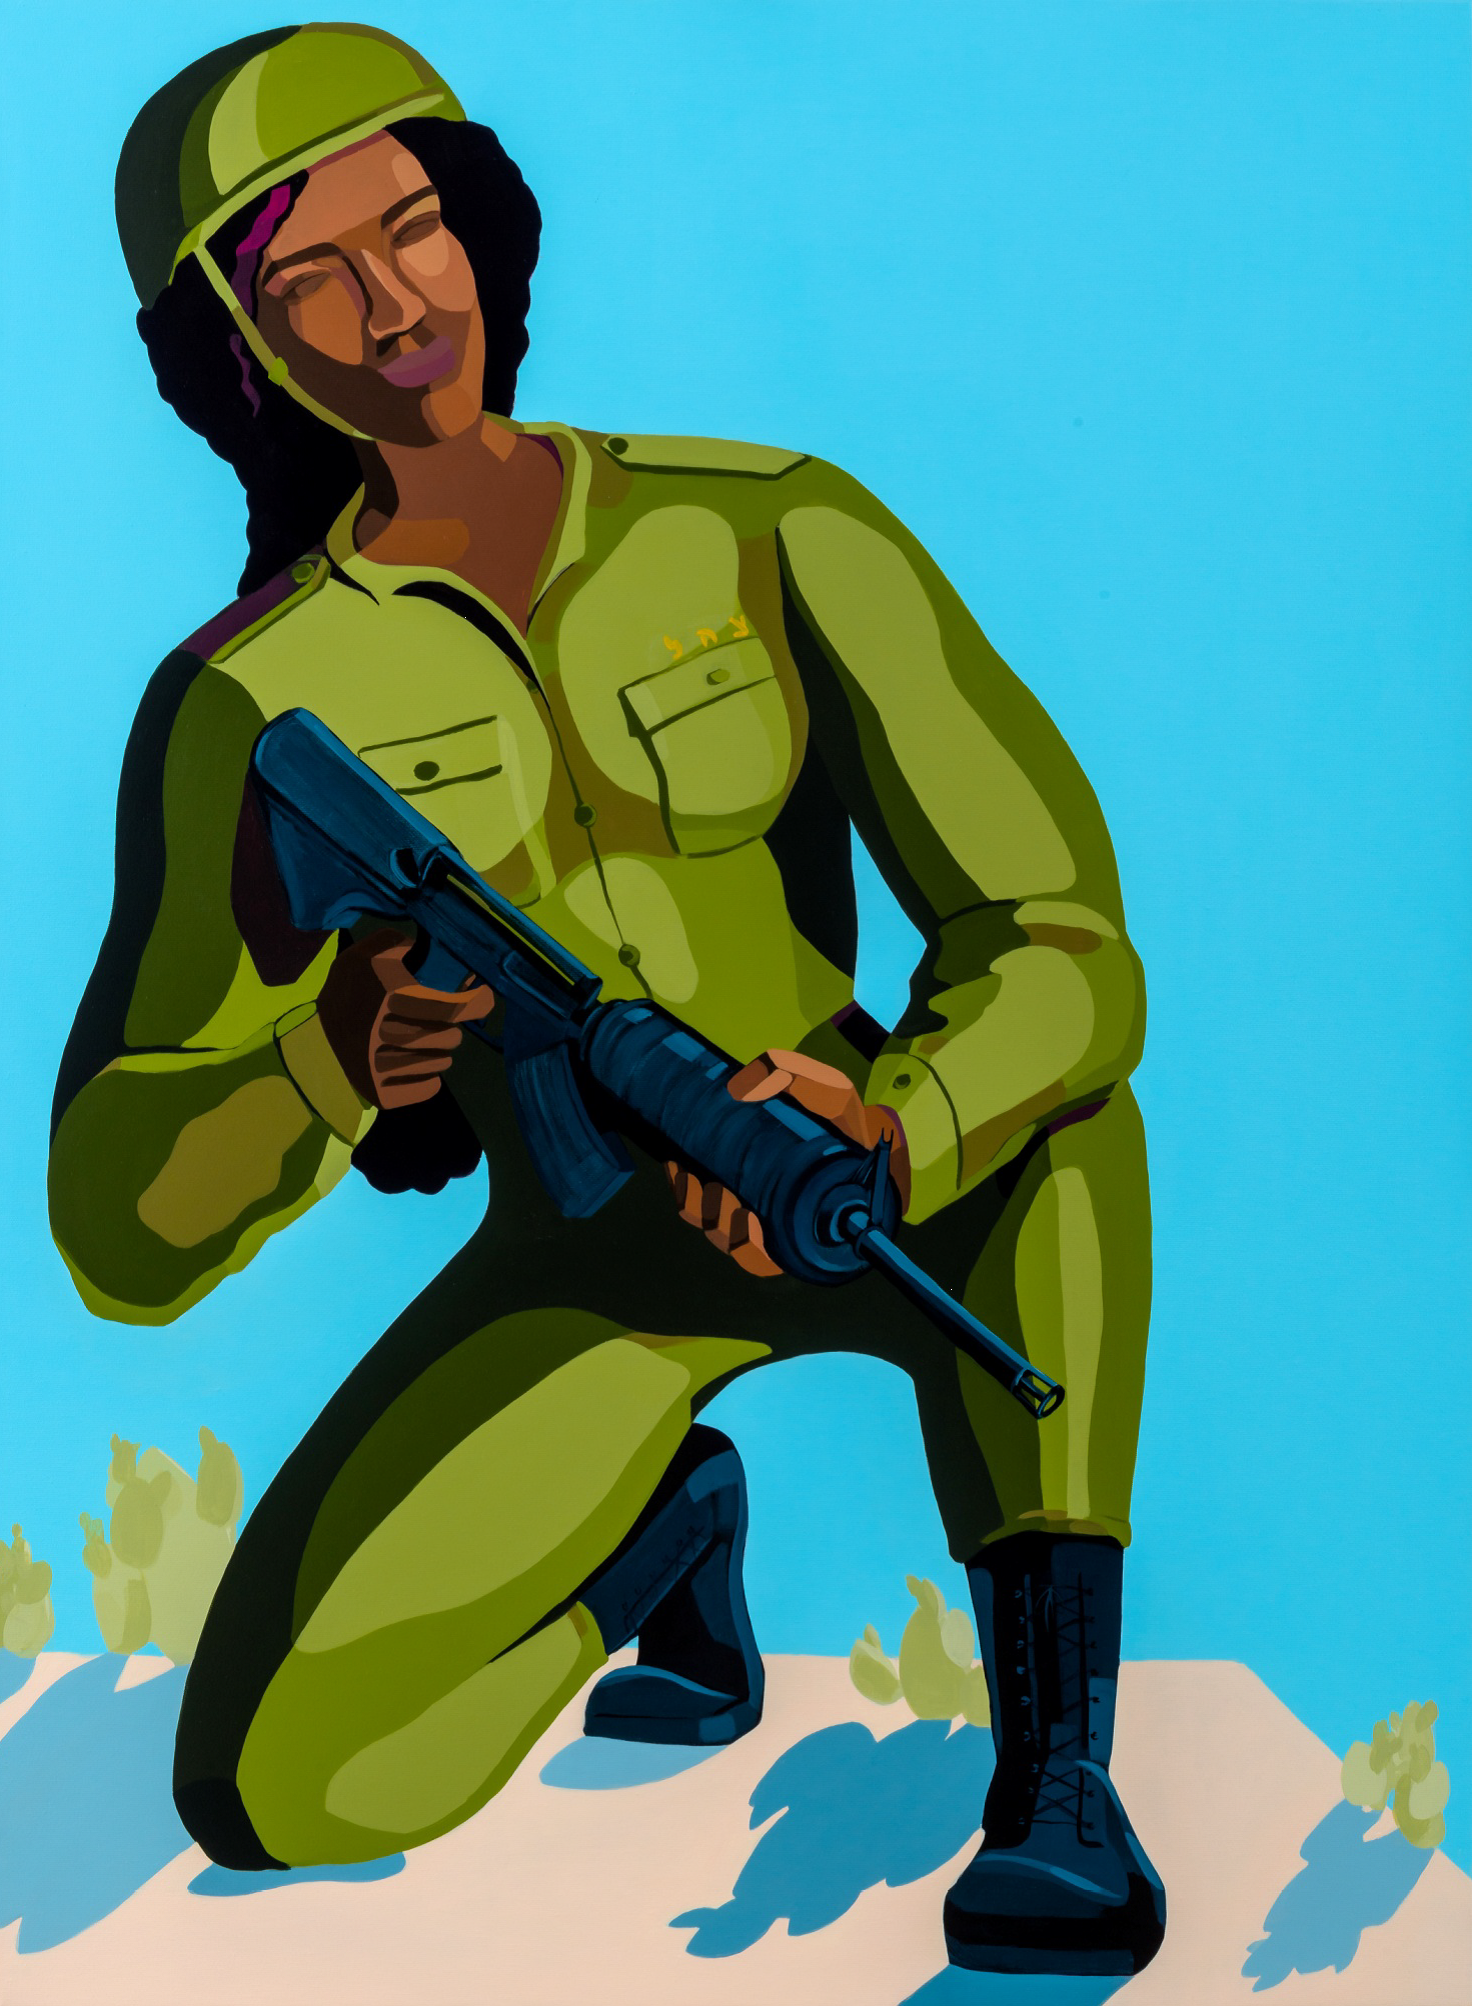 Nirit Takele, Soldier 5328991, 110x80.5 cm, acrylic on canvas, 2019